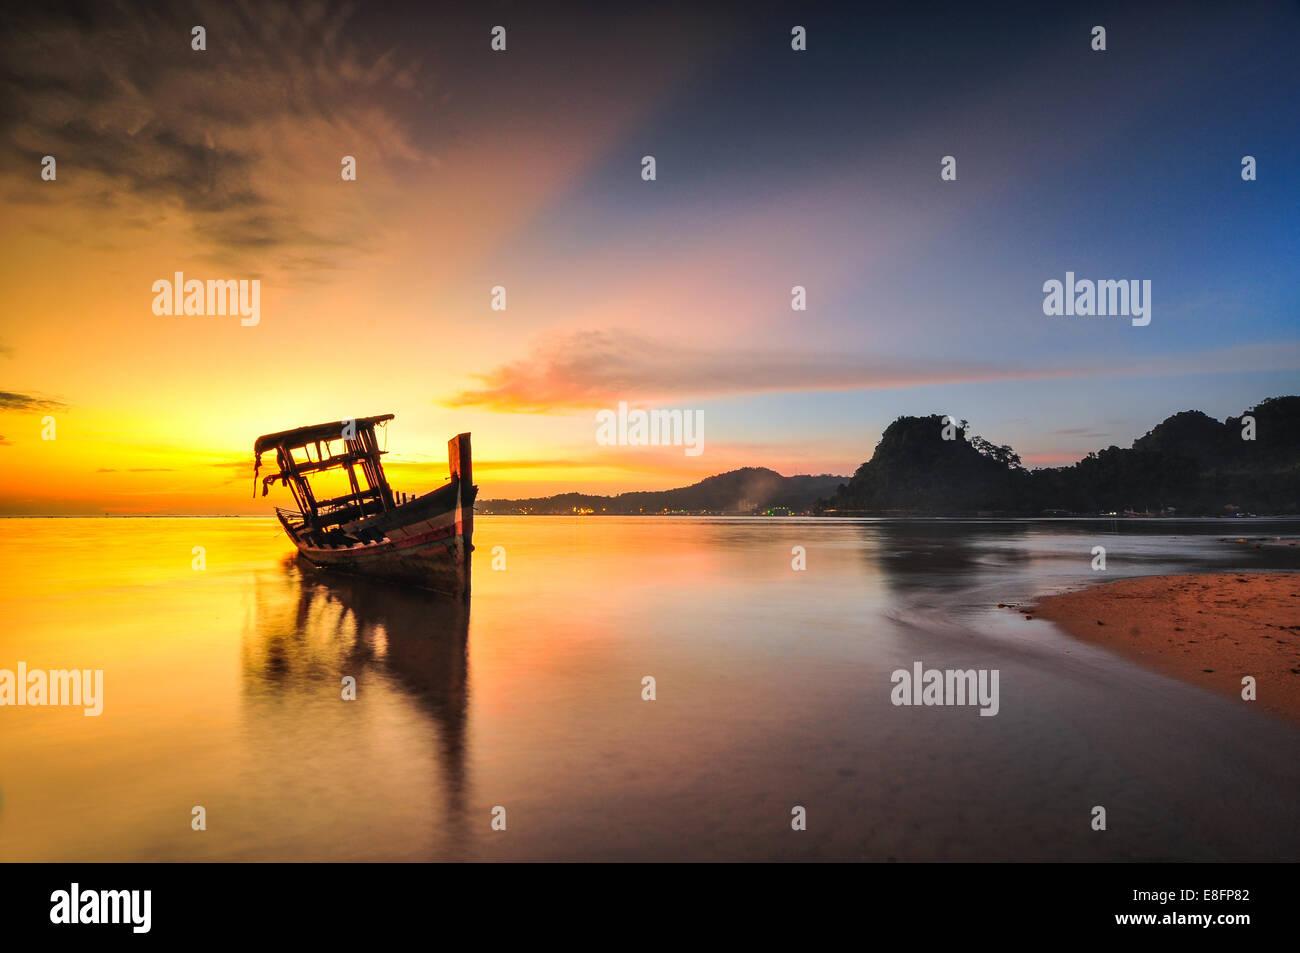 Camboya, vista sobre mar tongkang al amanecer. Imagen De Stock